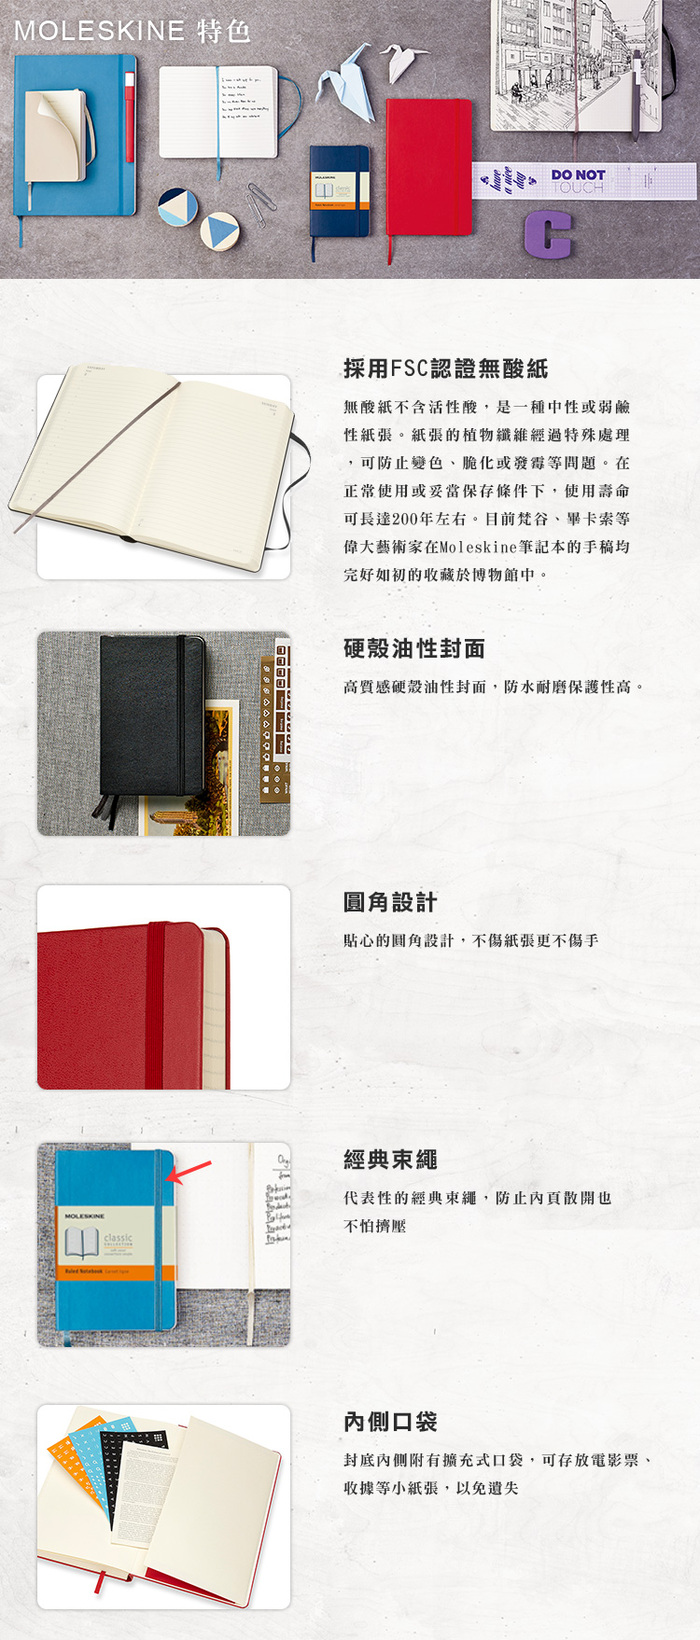 MOLESKINE 藝術系列素描本 口袋型